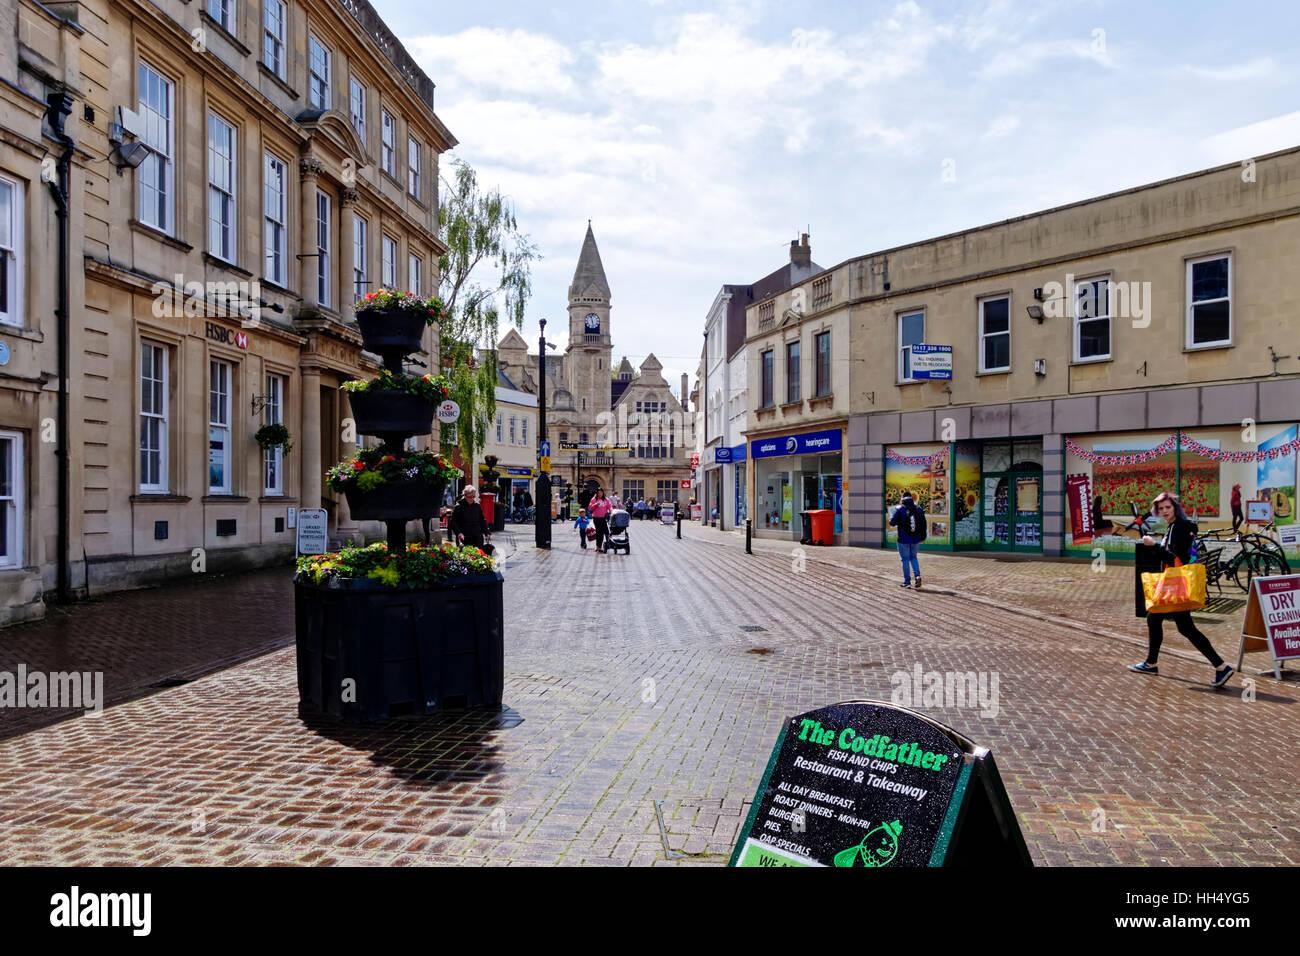 Fore Street, Trowbridge, Wiltshire, United Kingdom - Stock Image